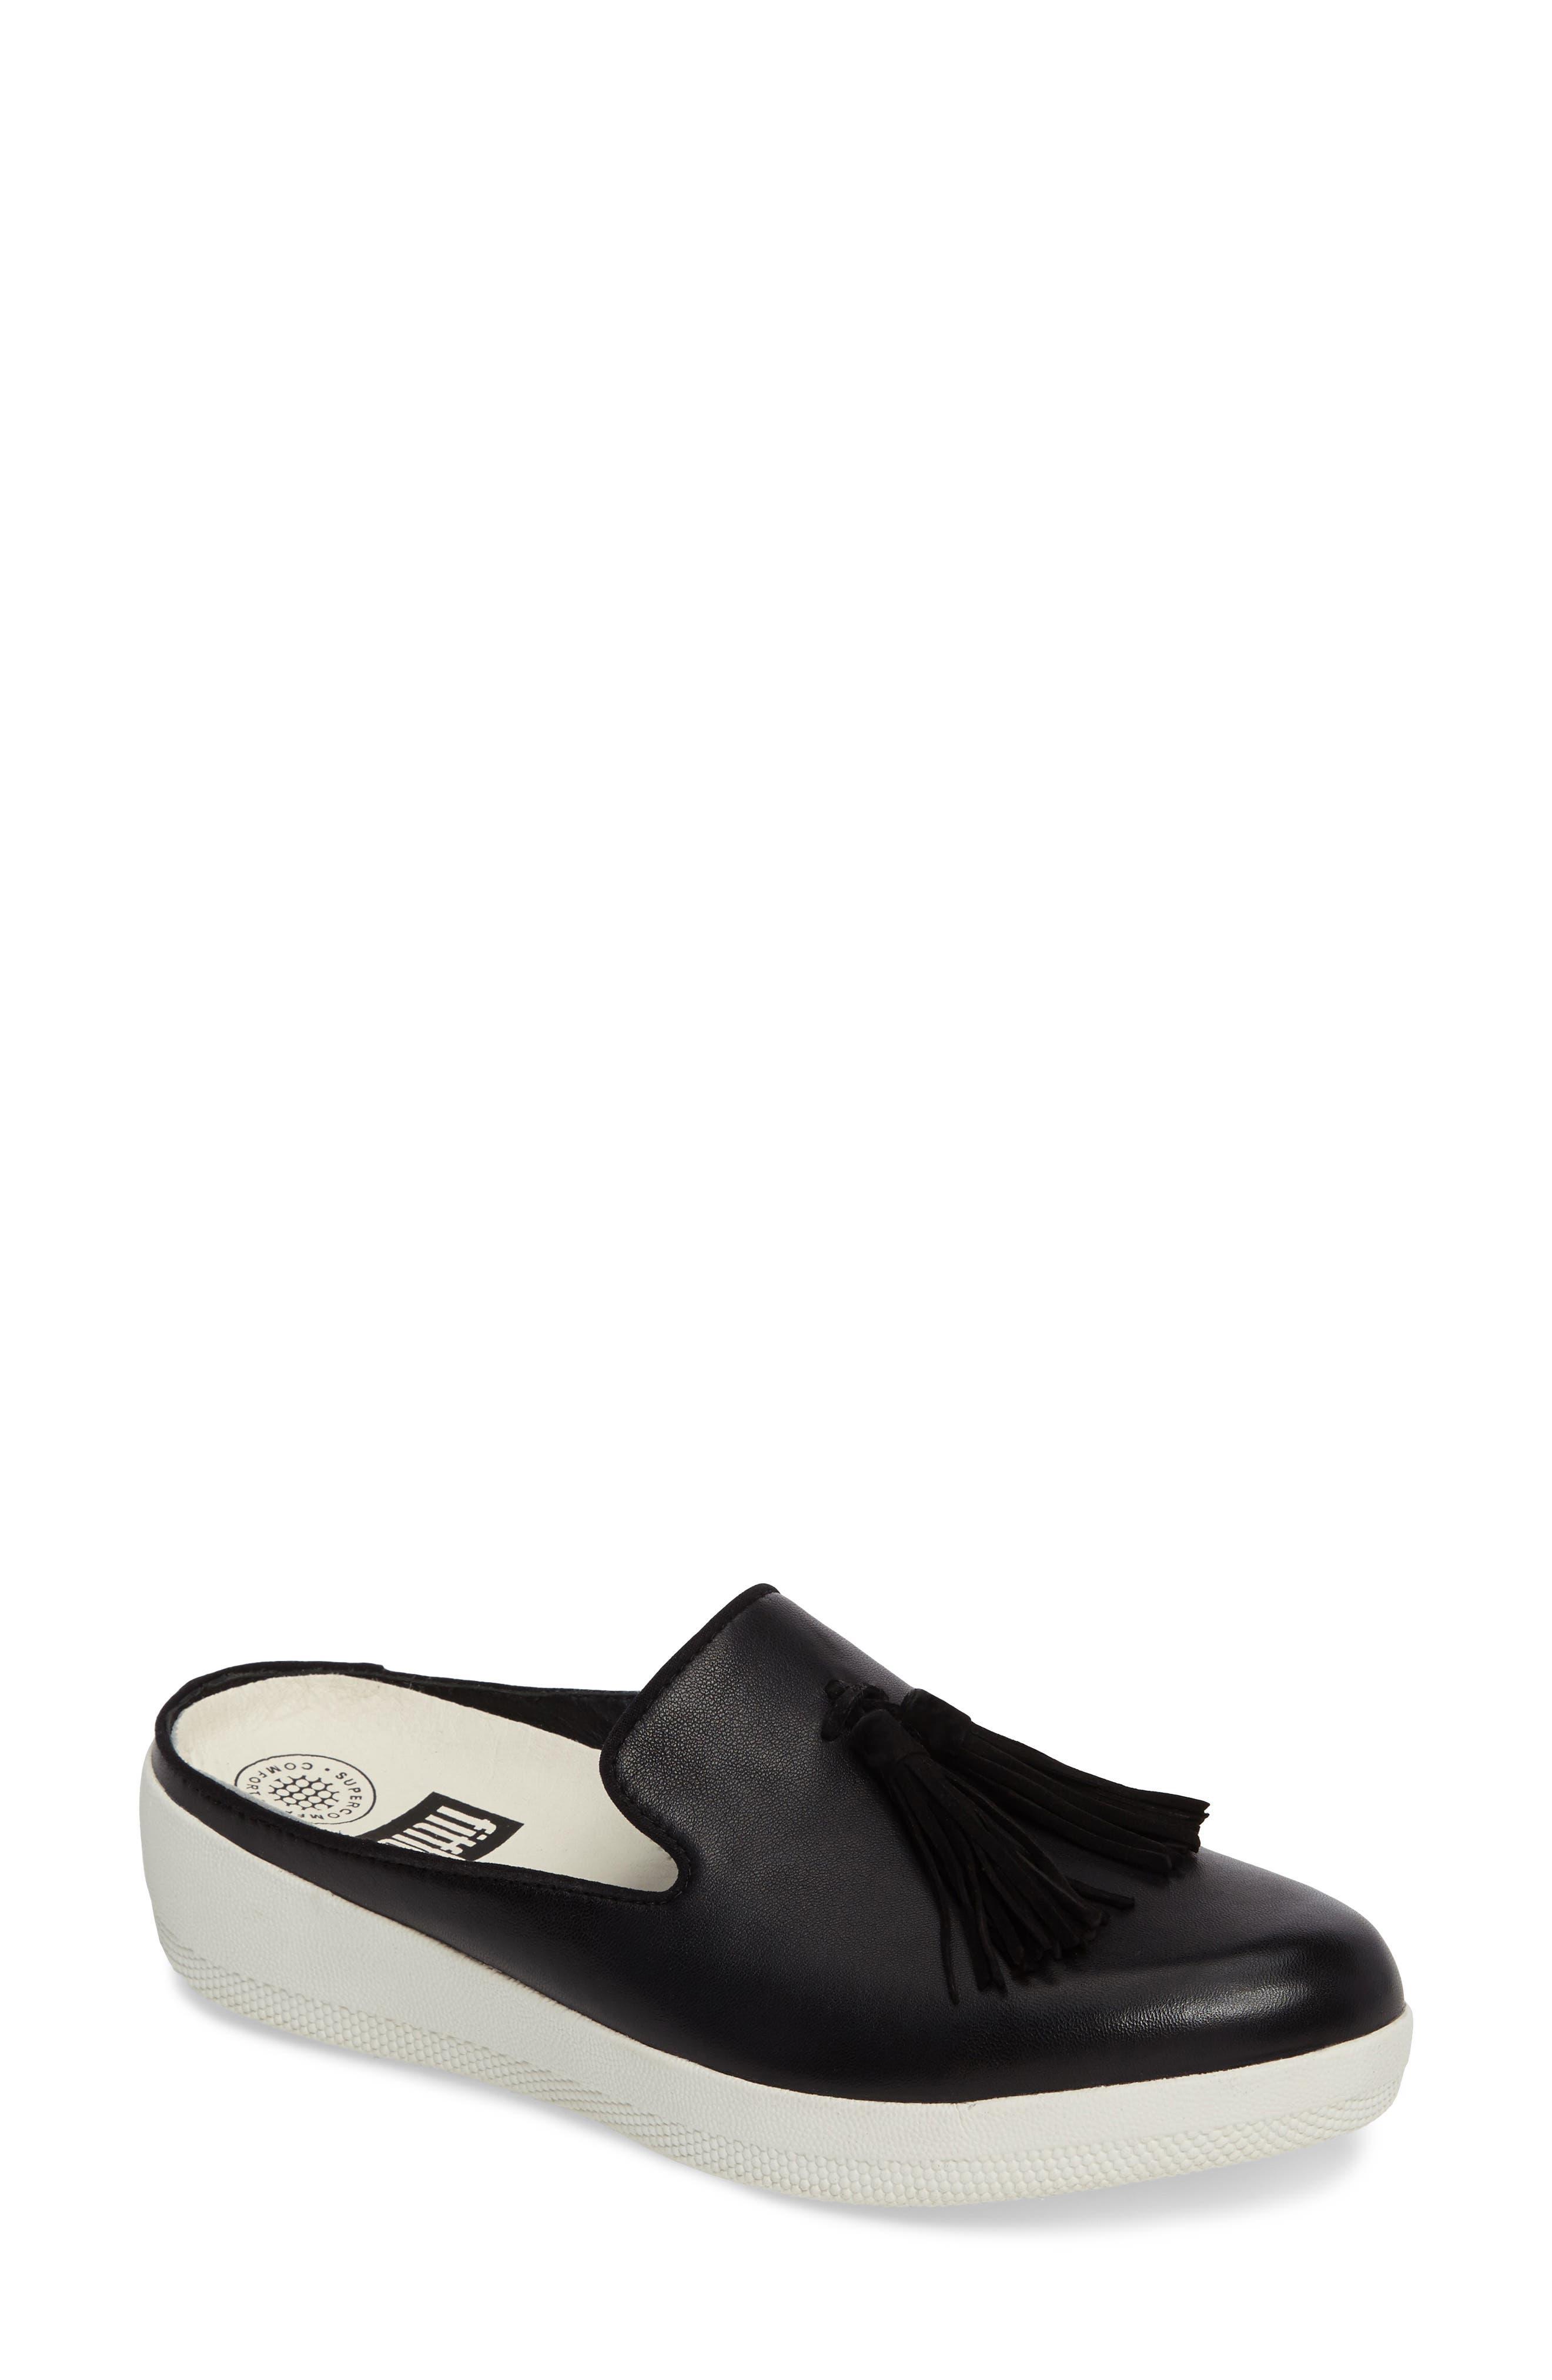 Alternate Image 1 Selected - FitFlop Superskate Tasseled Loafer Mule (Women)